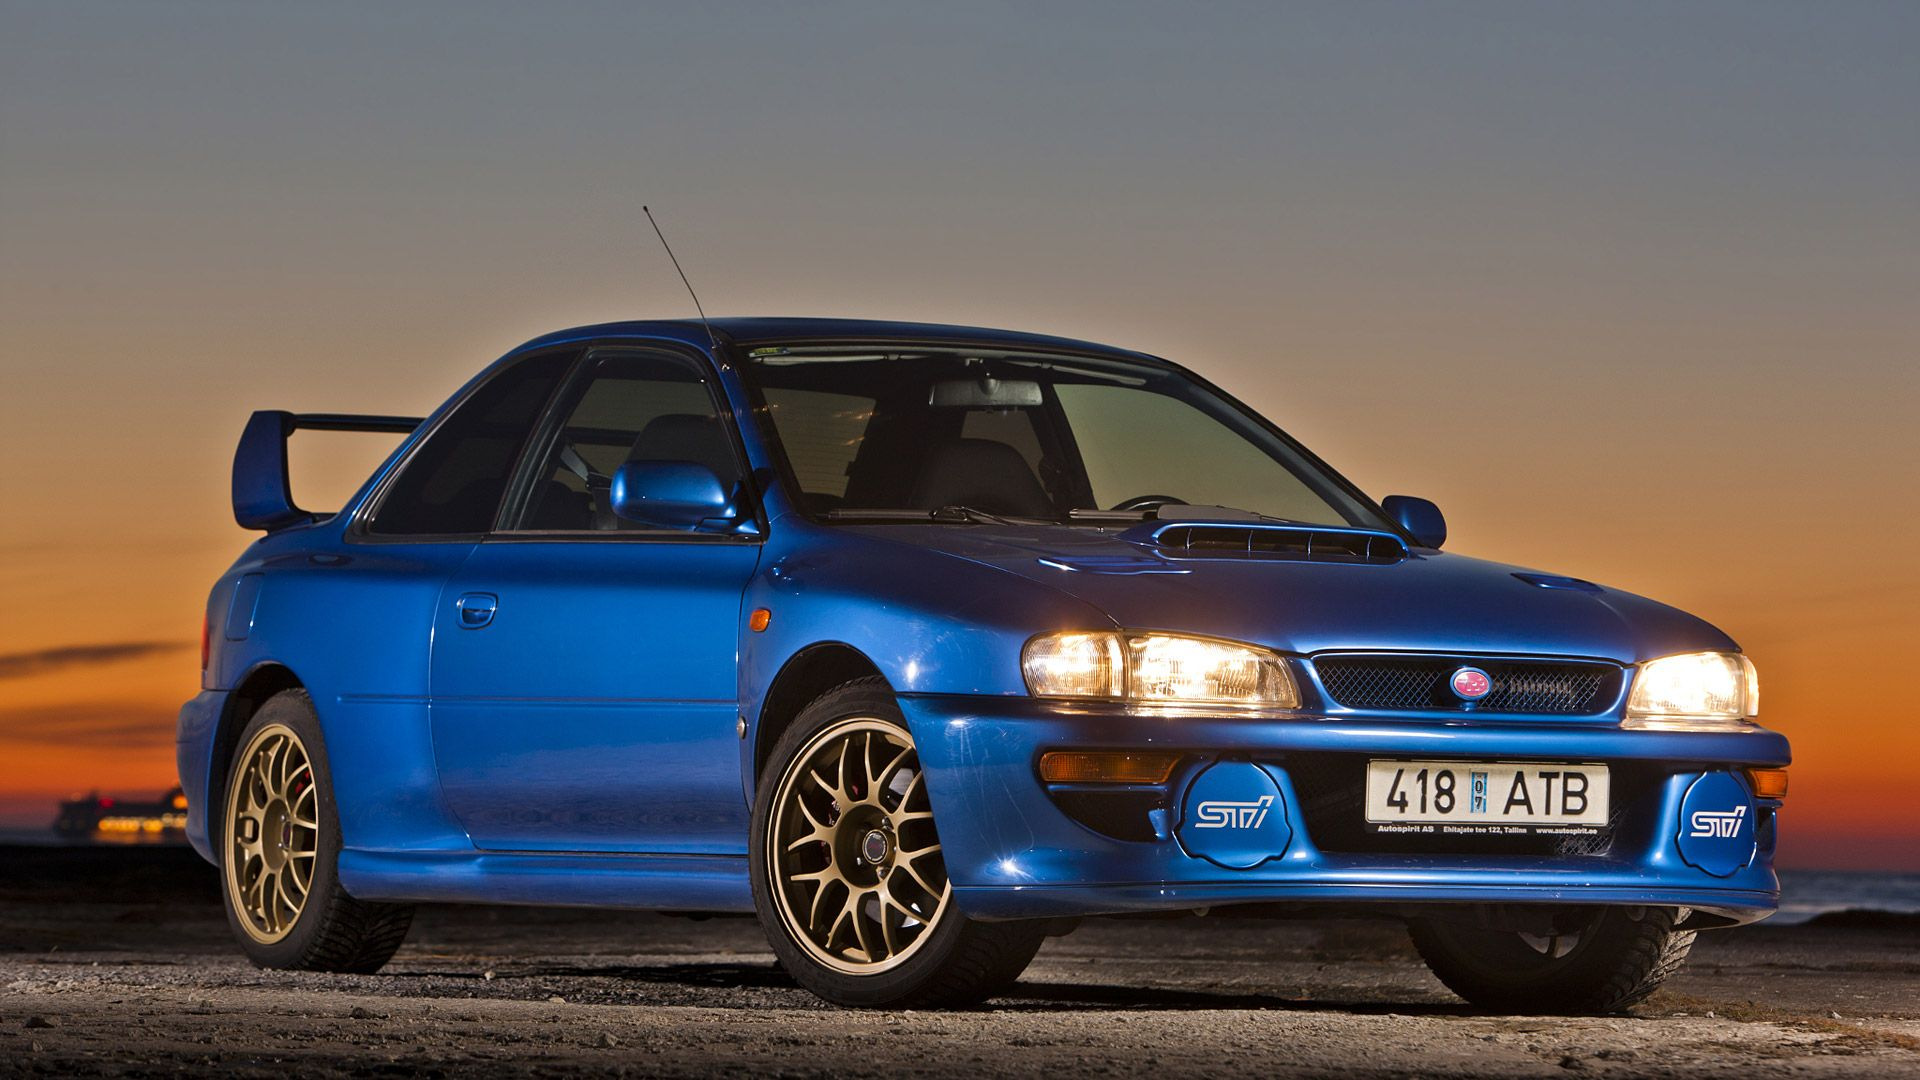 Subaru 22b Wallpapers Top Free Subaru 22b Backgrounds Wallpaperaccess